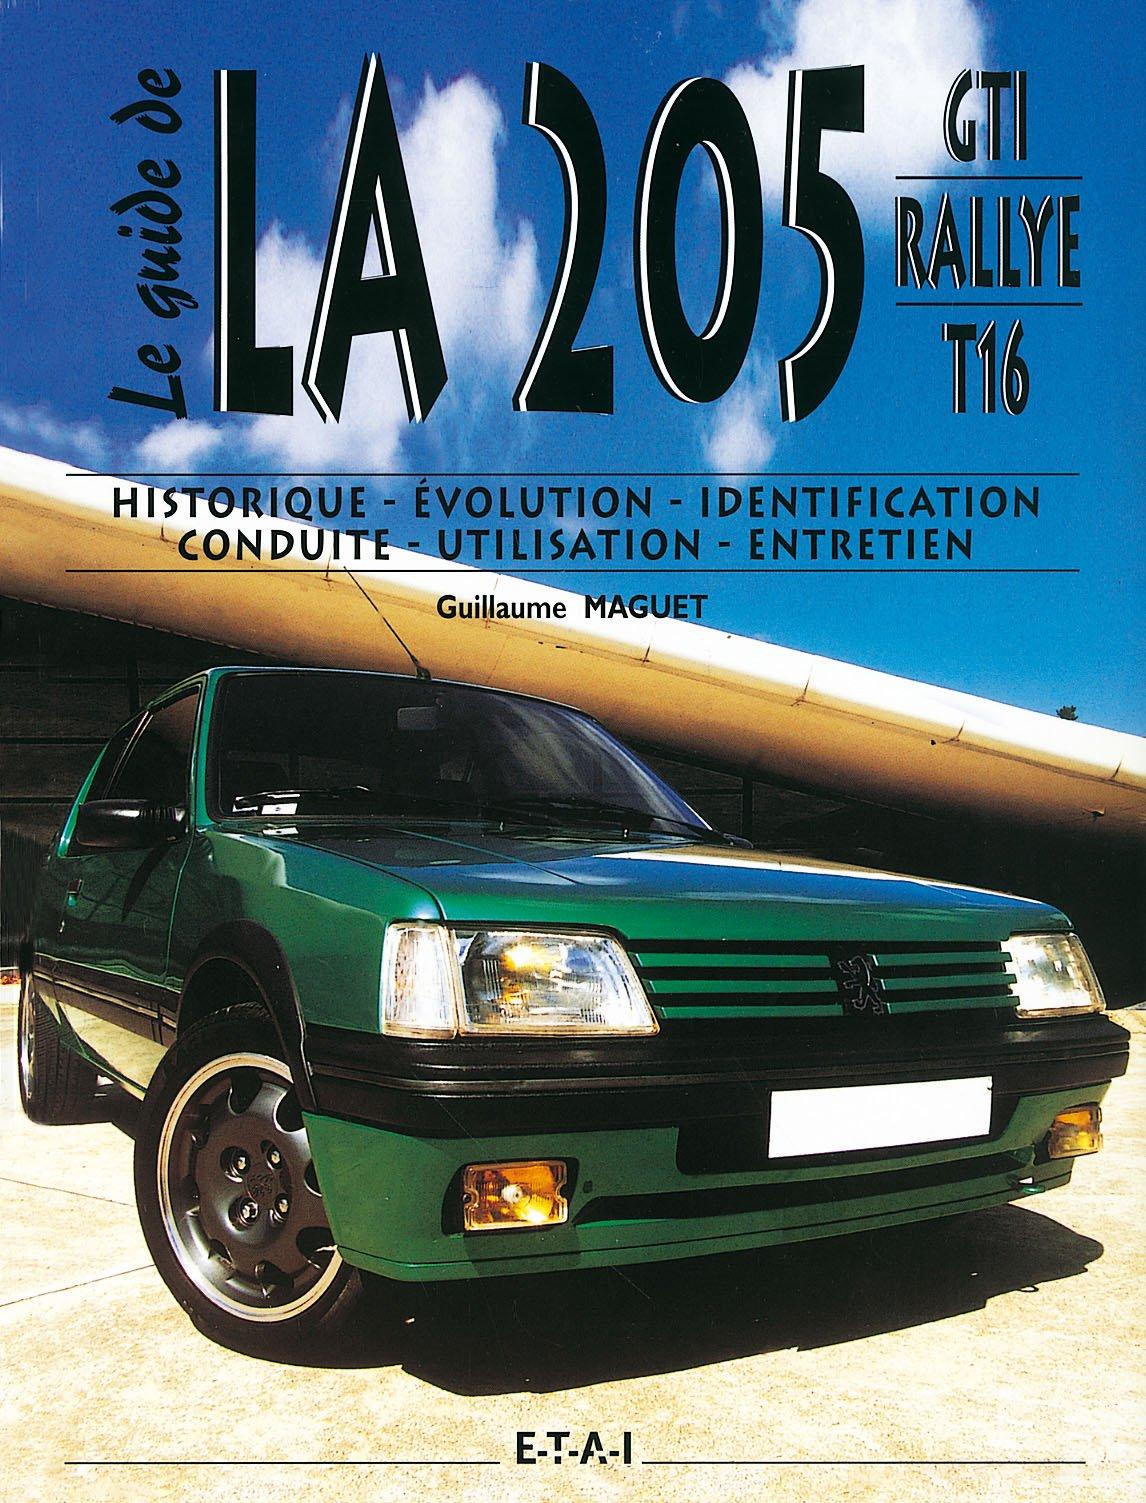 Guide peugeot 205 gti et 205 turbo 16 (Le guide): Amazon.es: Guillaume Maguet: Libros en idiomas extranjeros